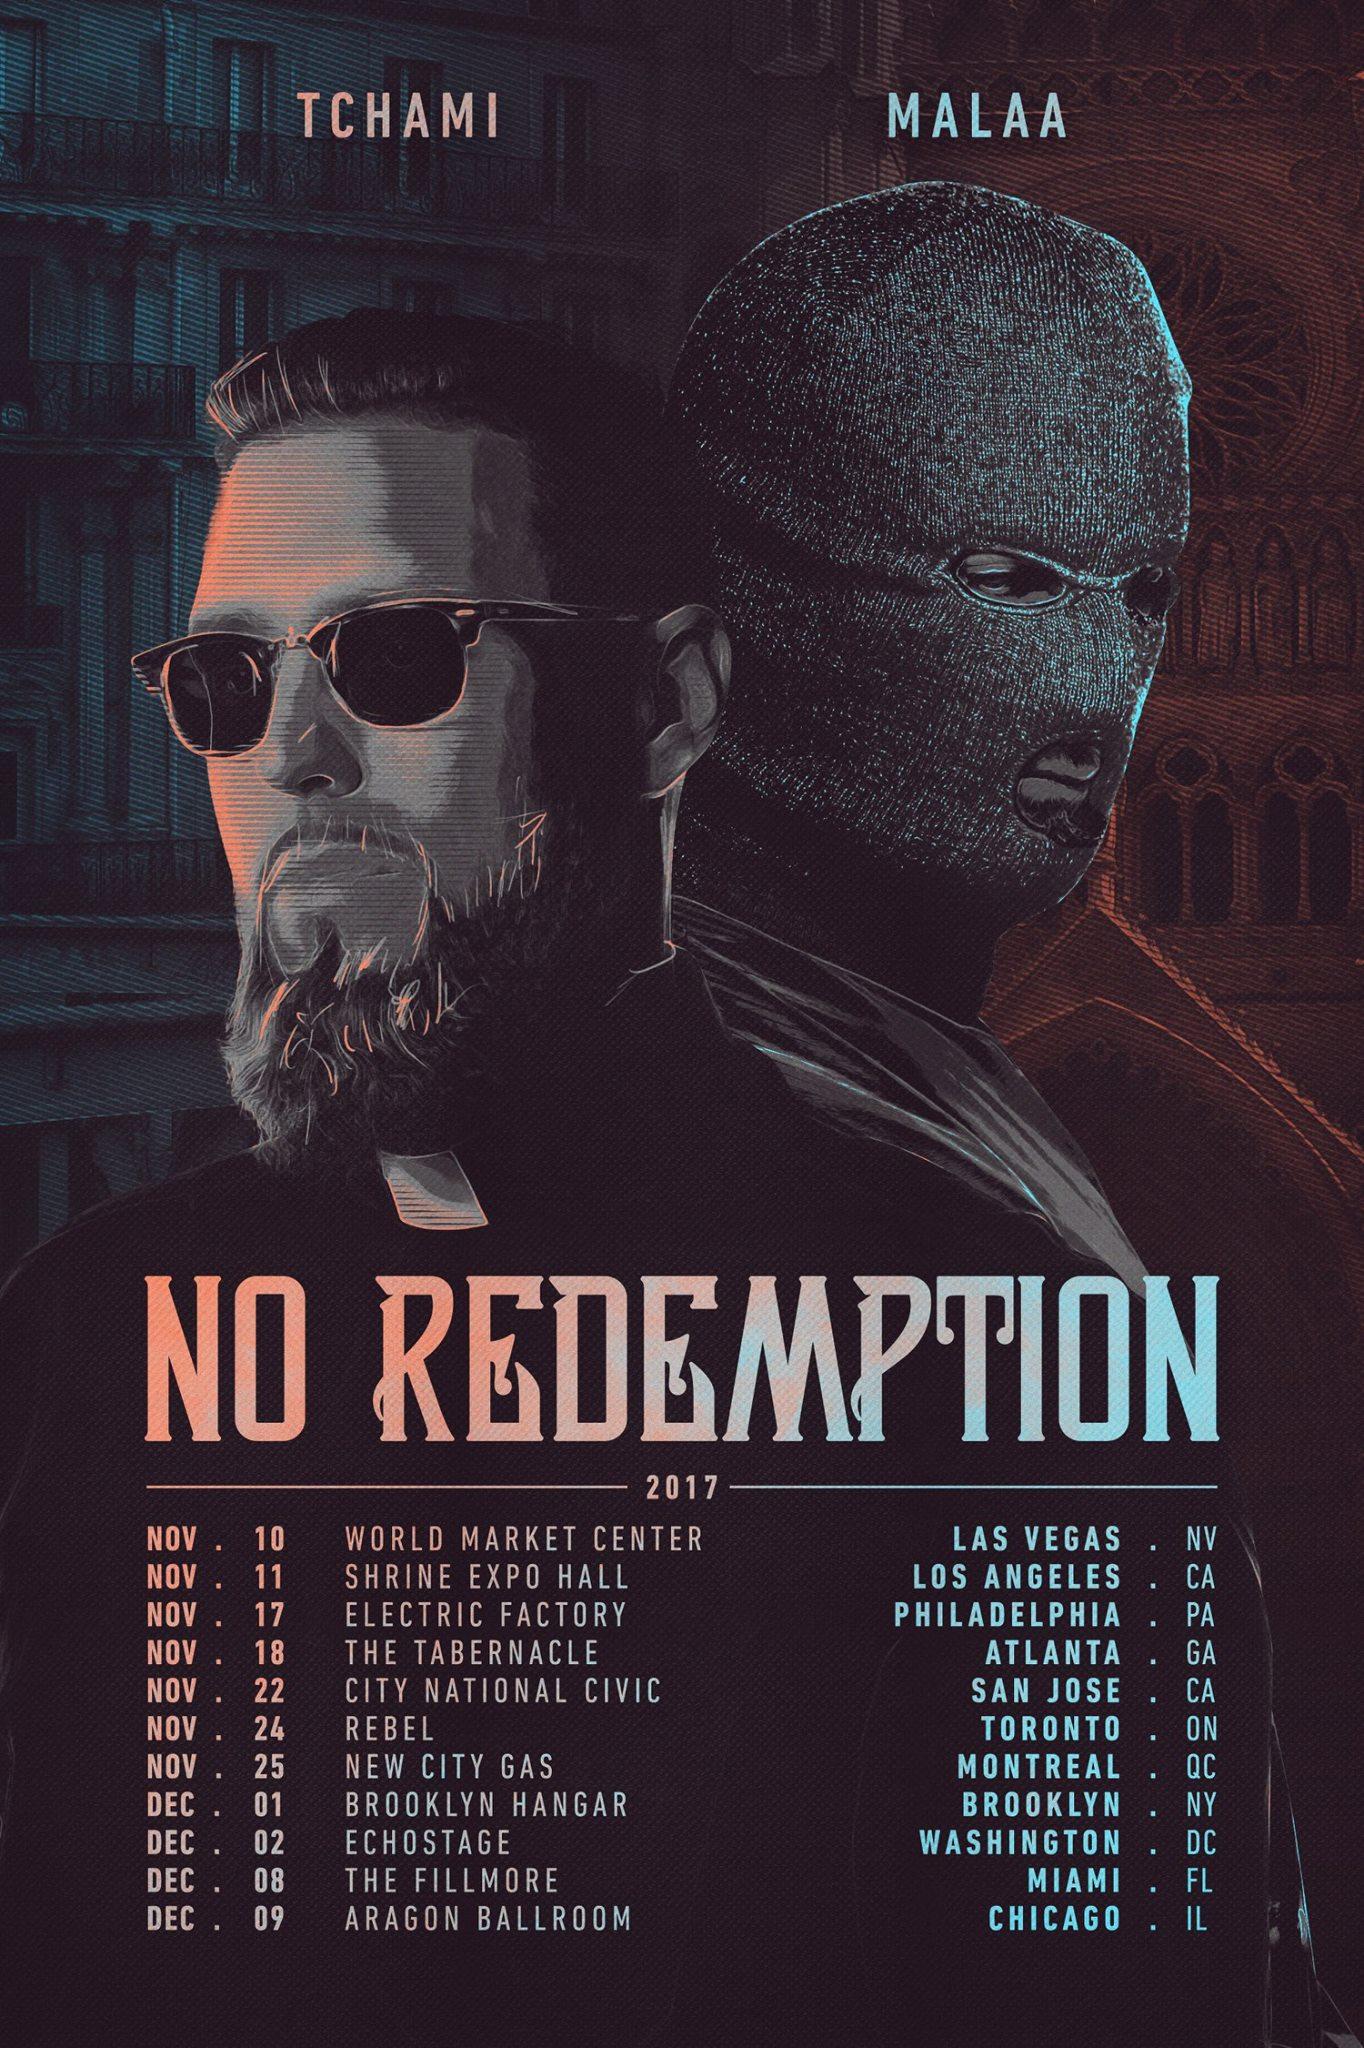 No Redemption Tour Chicago